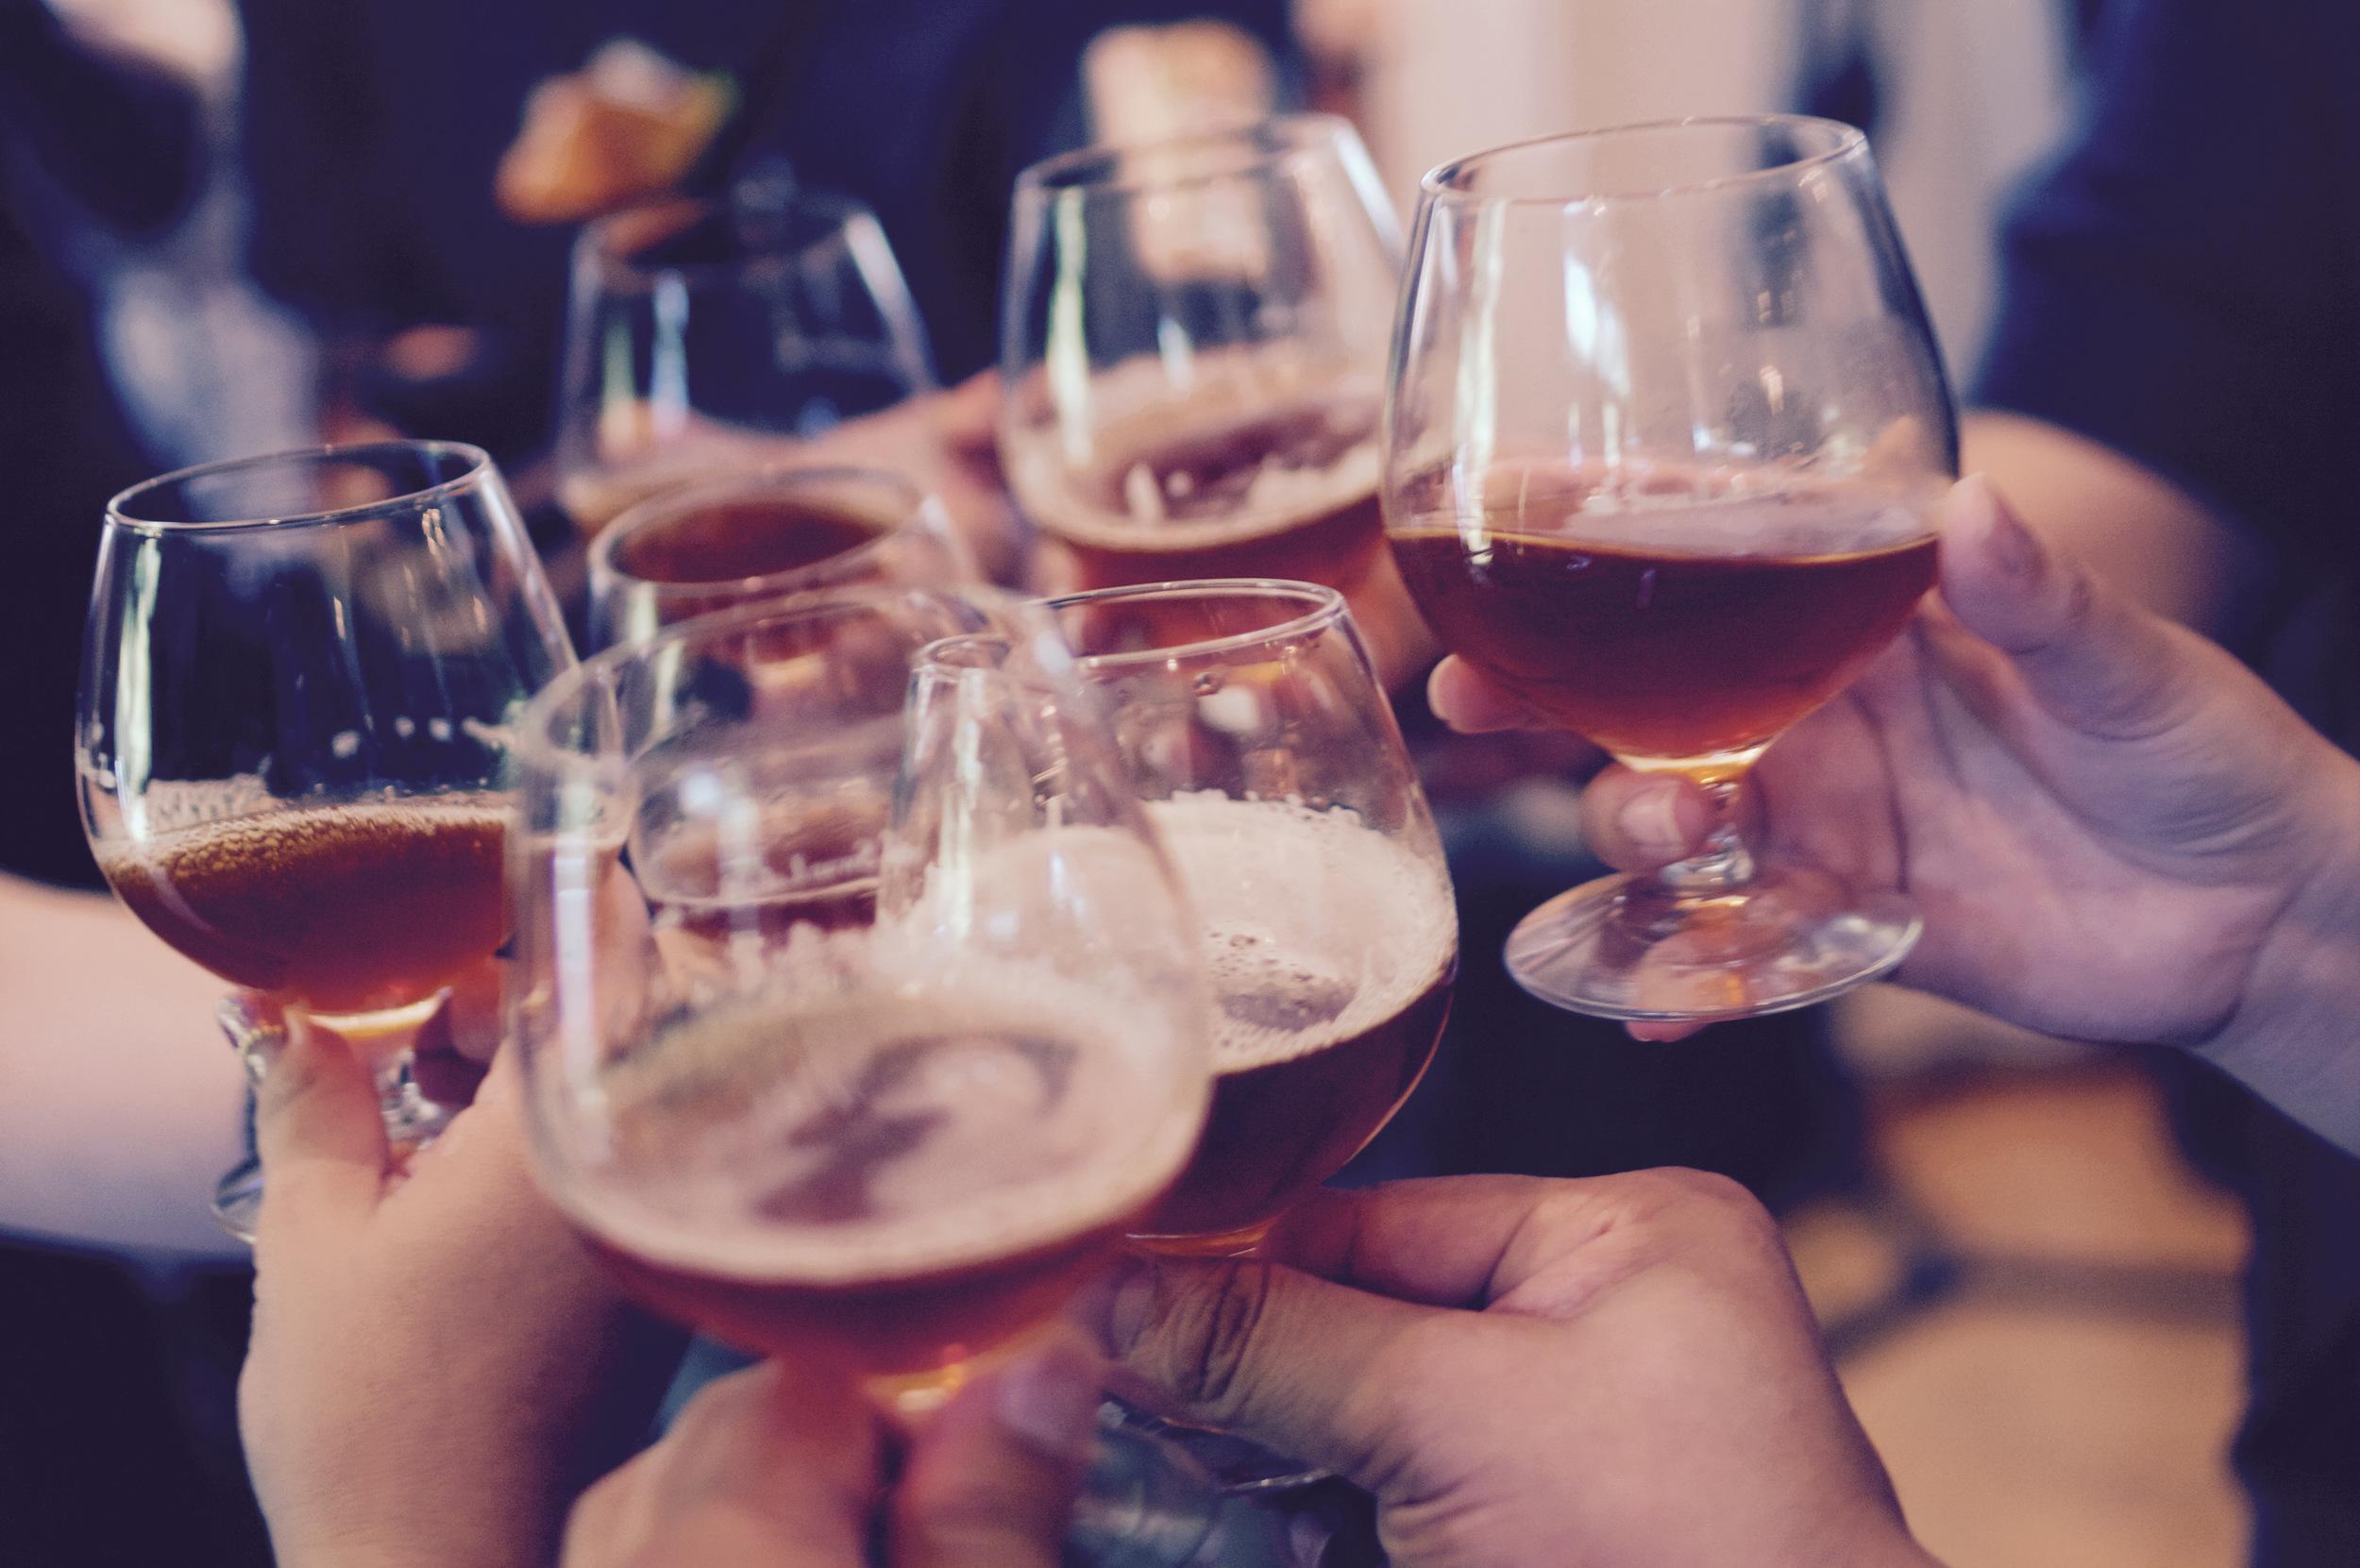 cheers-wedding-toast-glasses